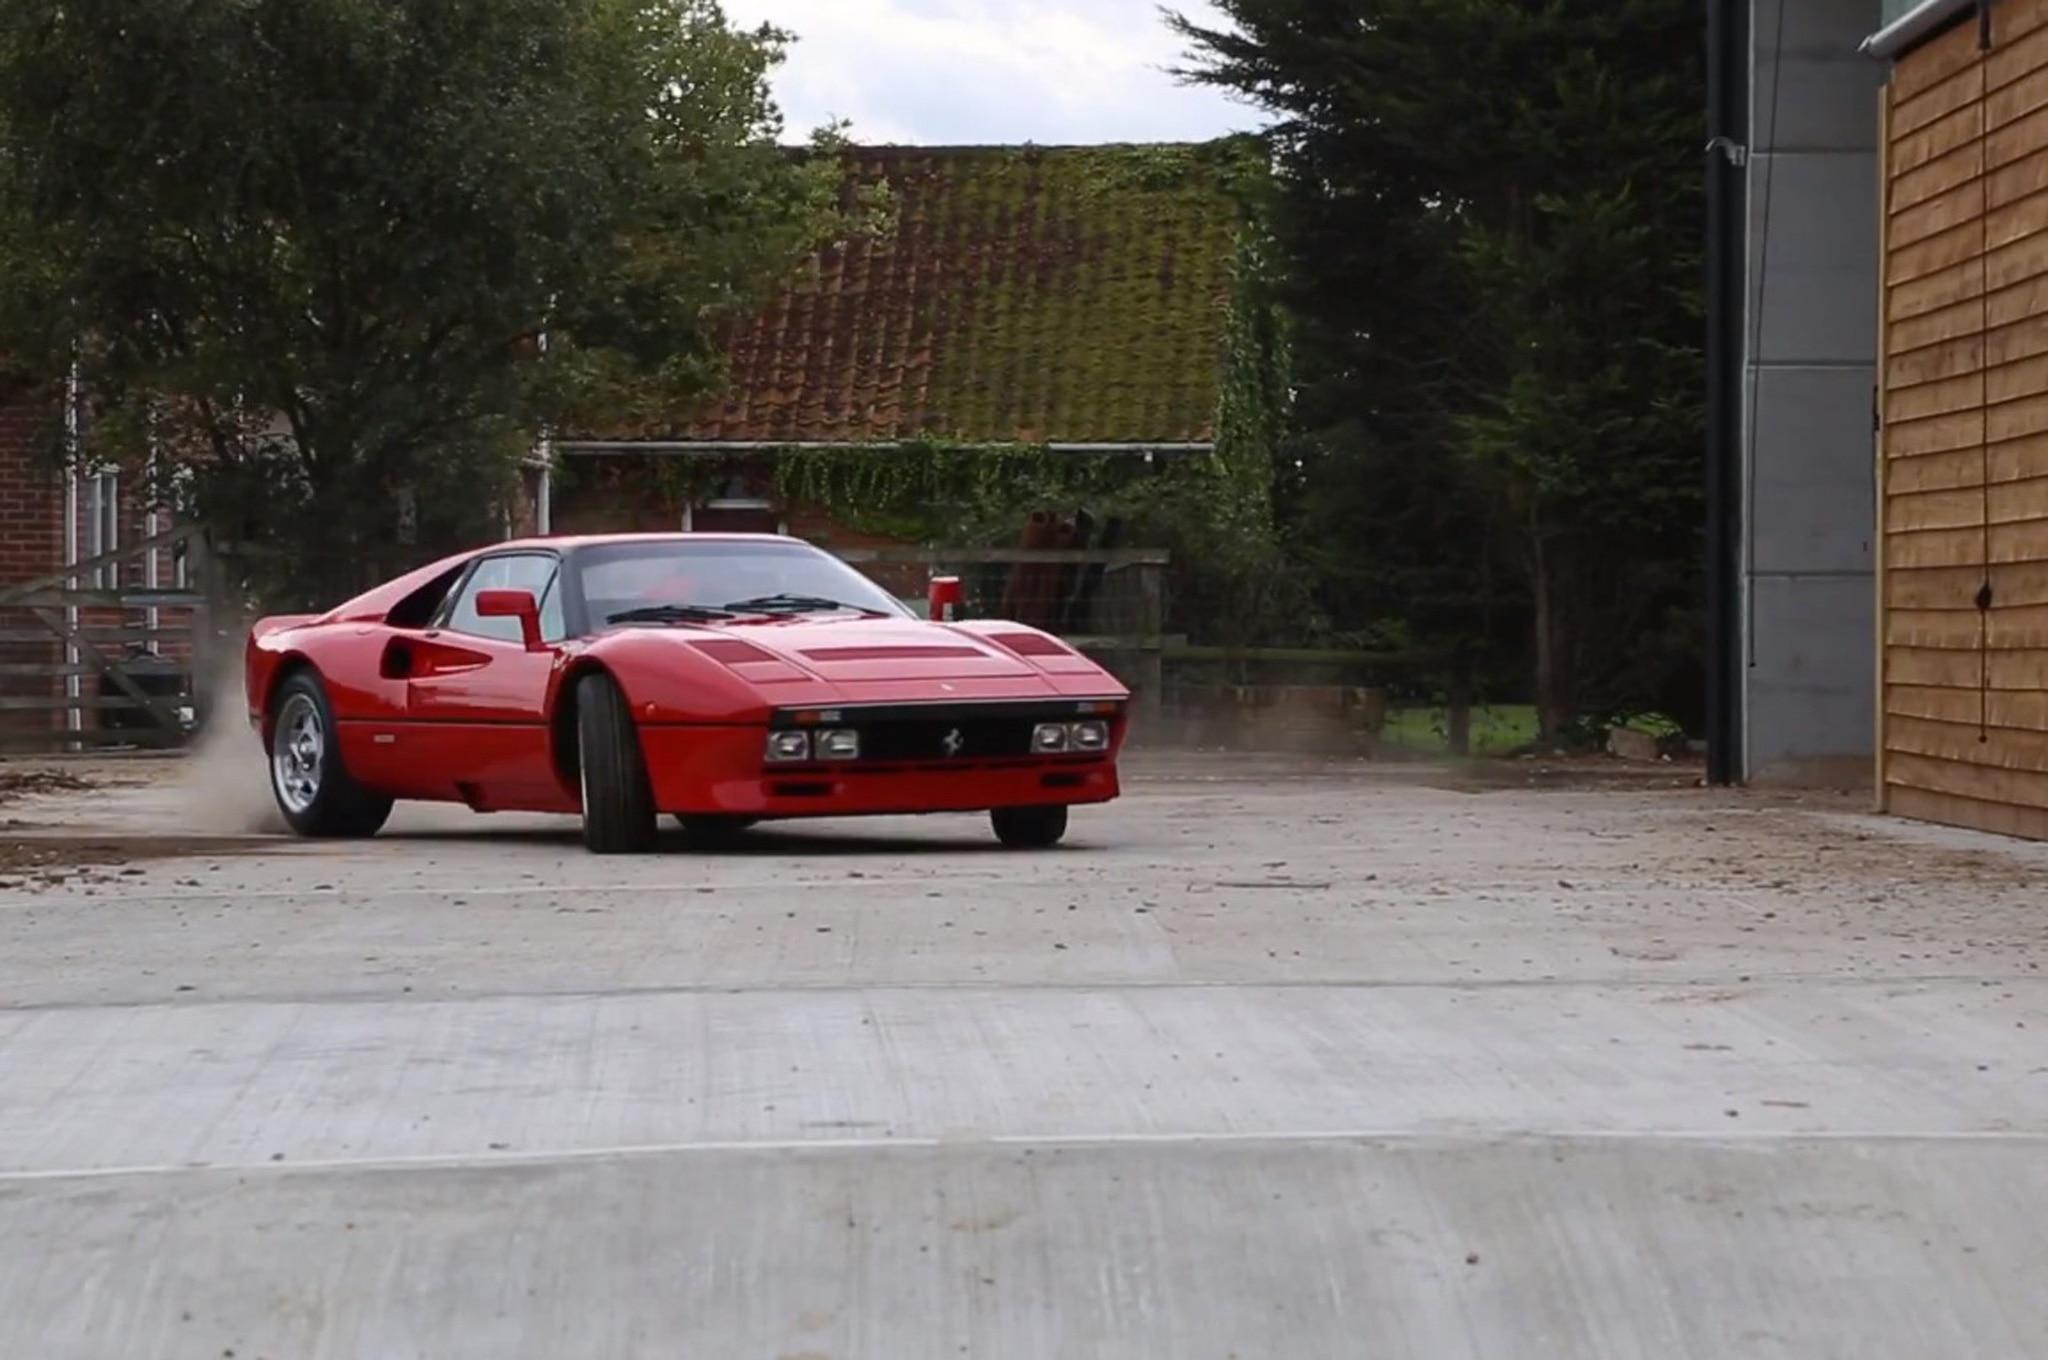 Watch A $1.3 Million Ferrari 288 GTO Rally Around A Farm